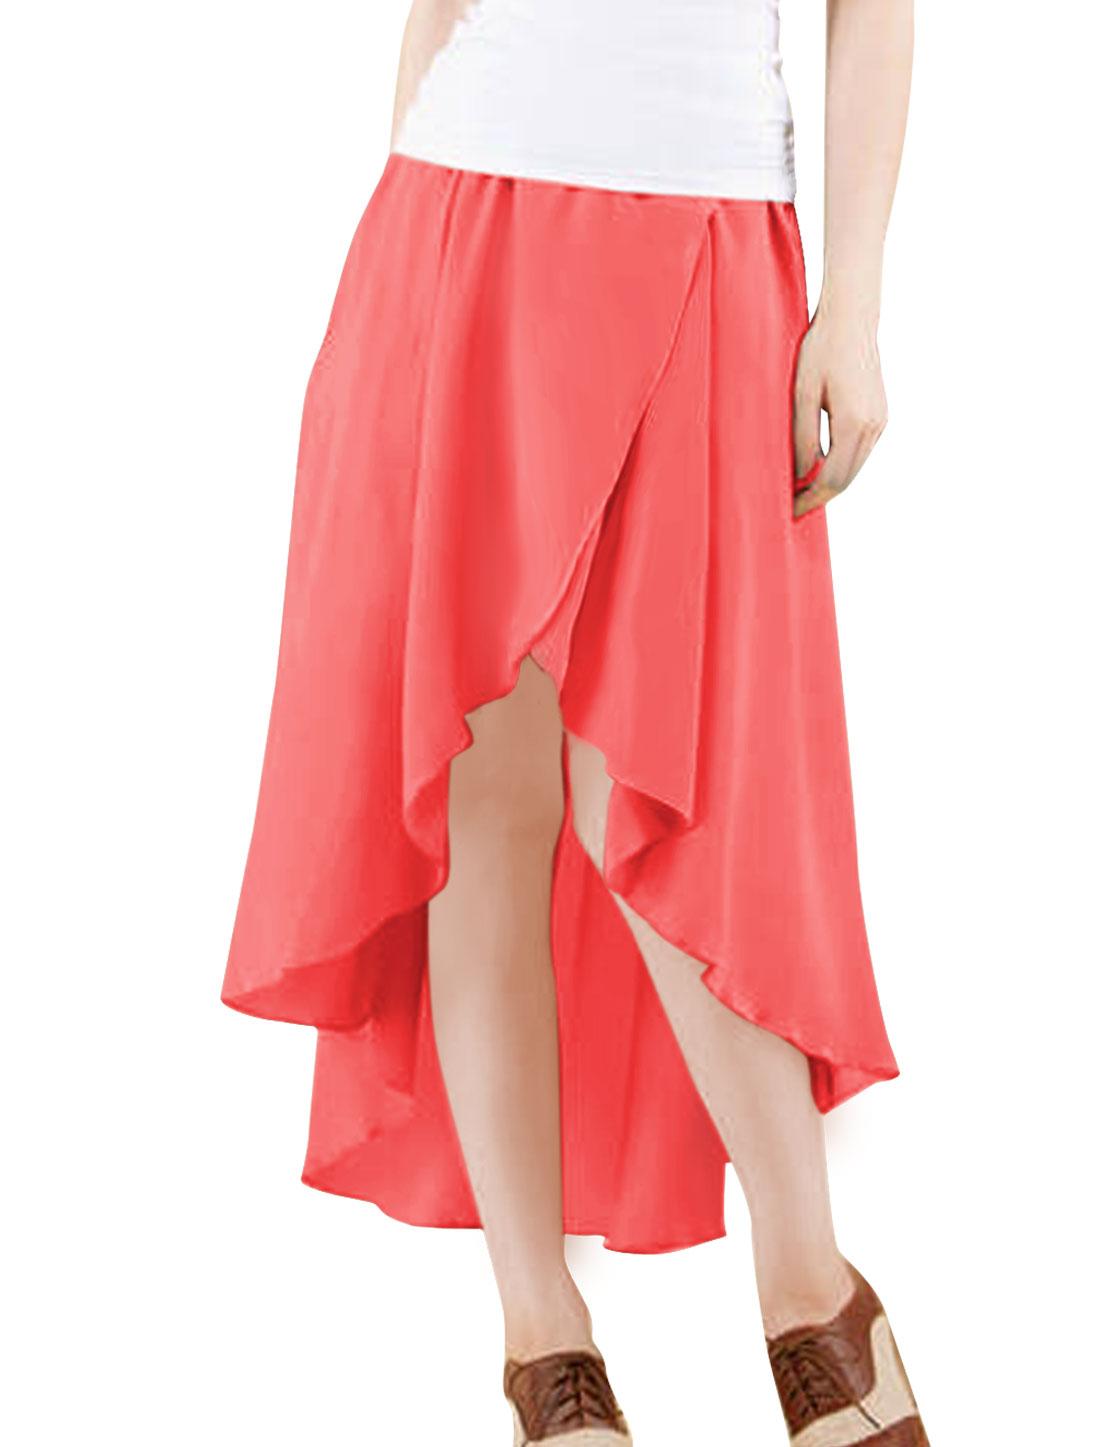 Woman Elastic Waist Low-high Hem Midi Skirt Solid Watermelon Red S